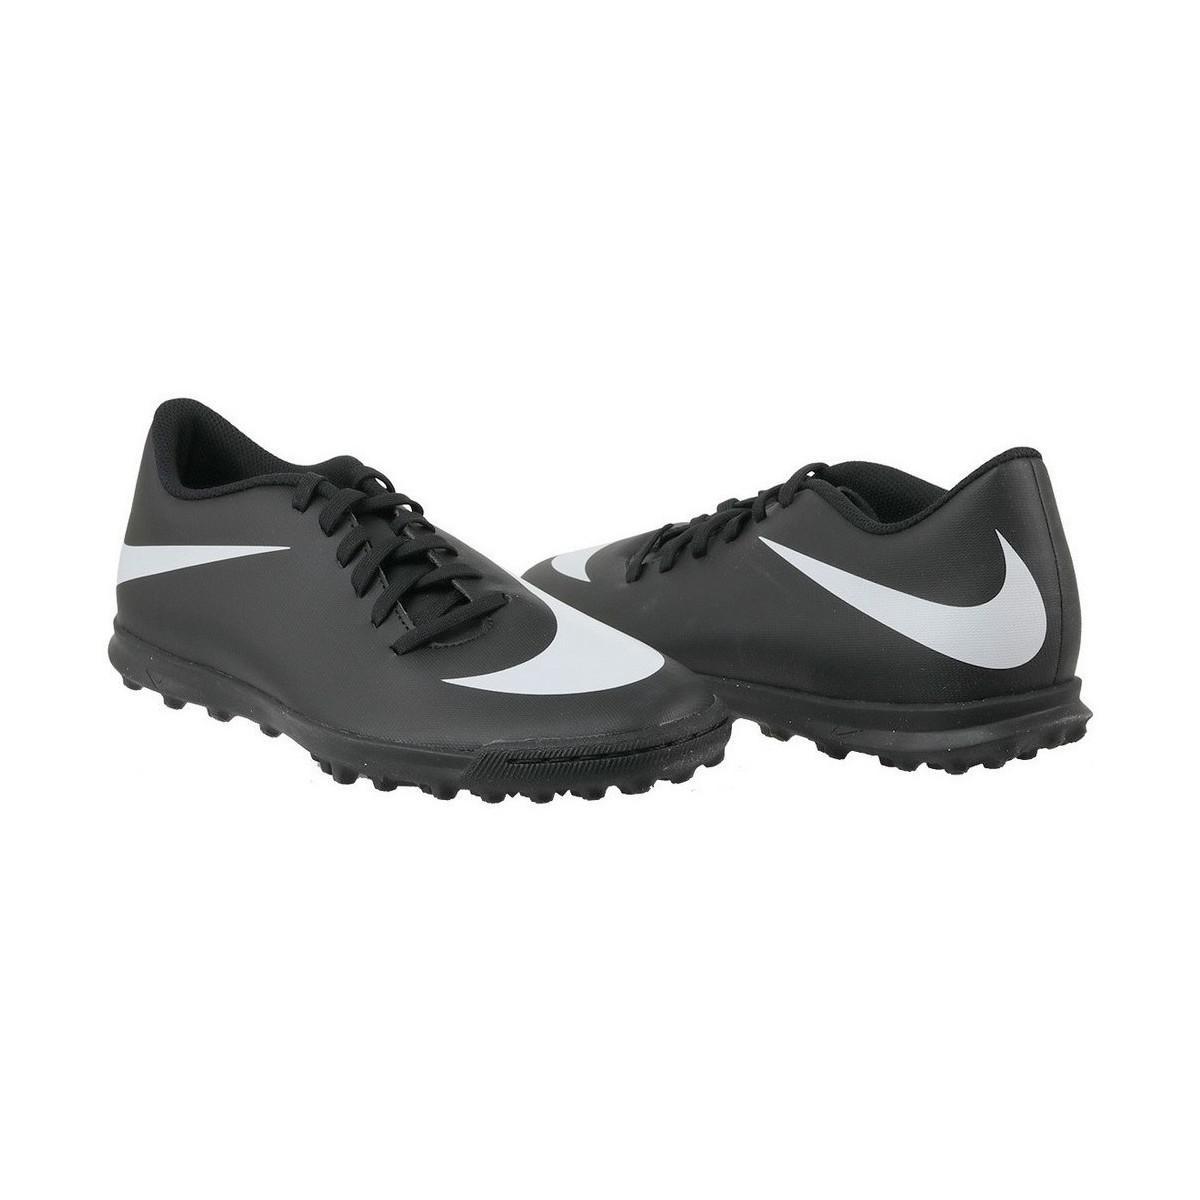 Nike - Bravatax Ii Tf Men s Football Boots In Black for Men - Lyst. View  fullscreen b2760897c018